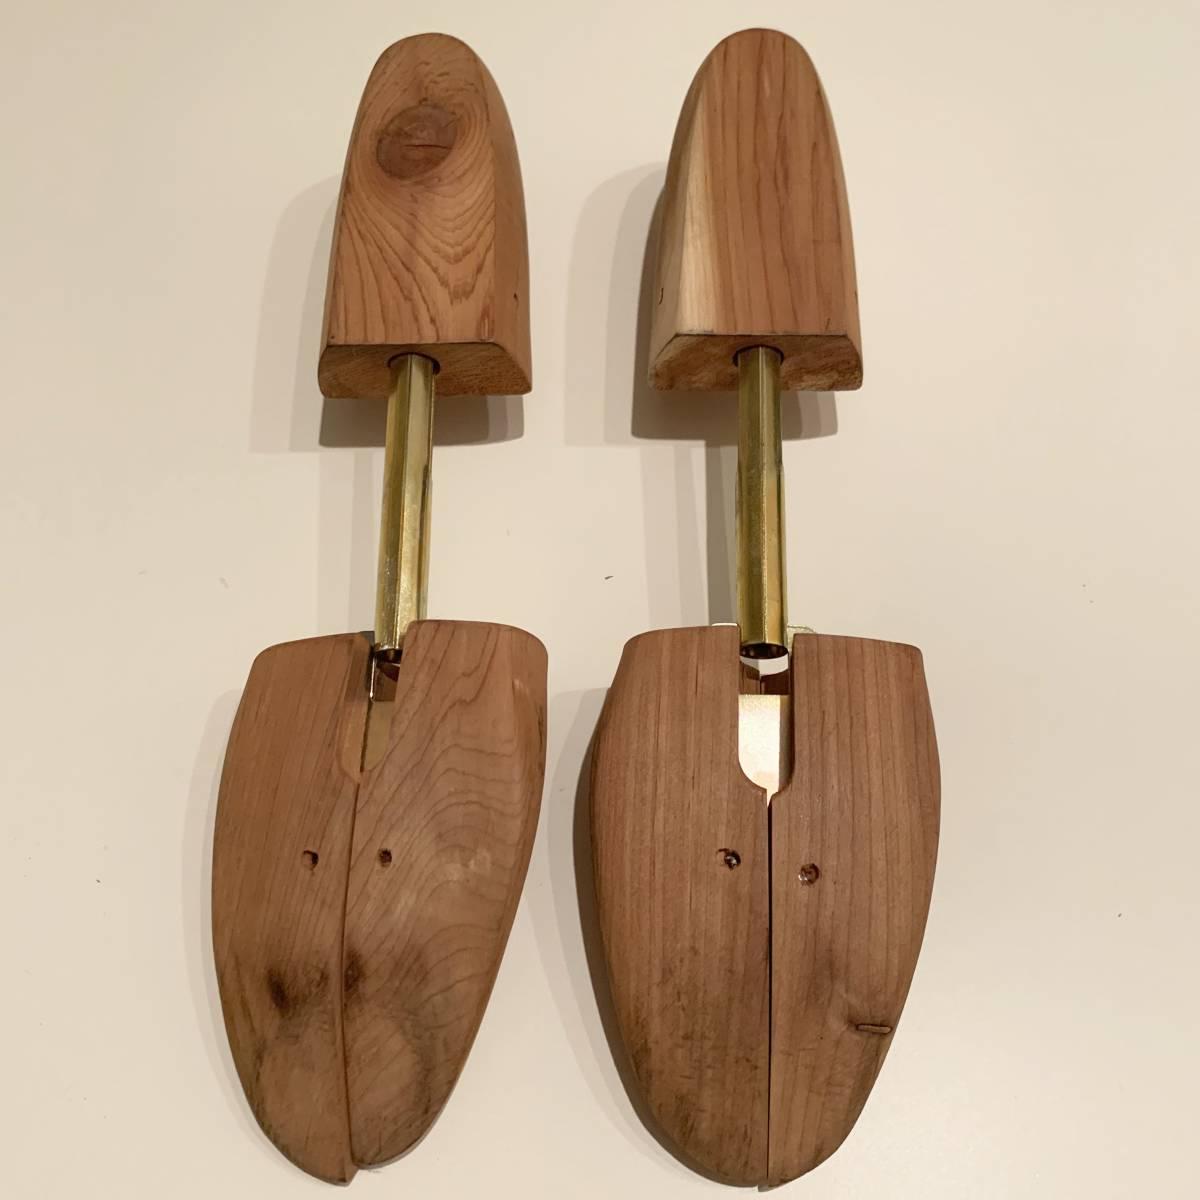 Rochester Shoe Tree Company 木製シューツリー シューキーパー (26cm~27cm)_画像3